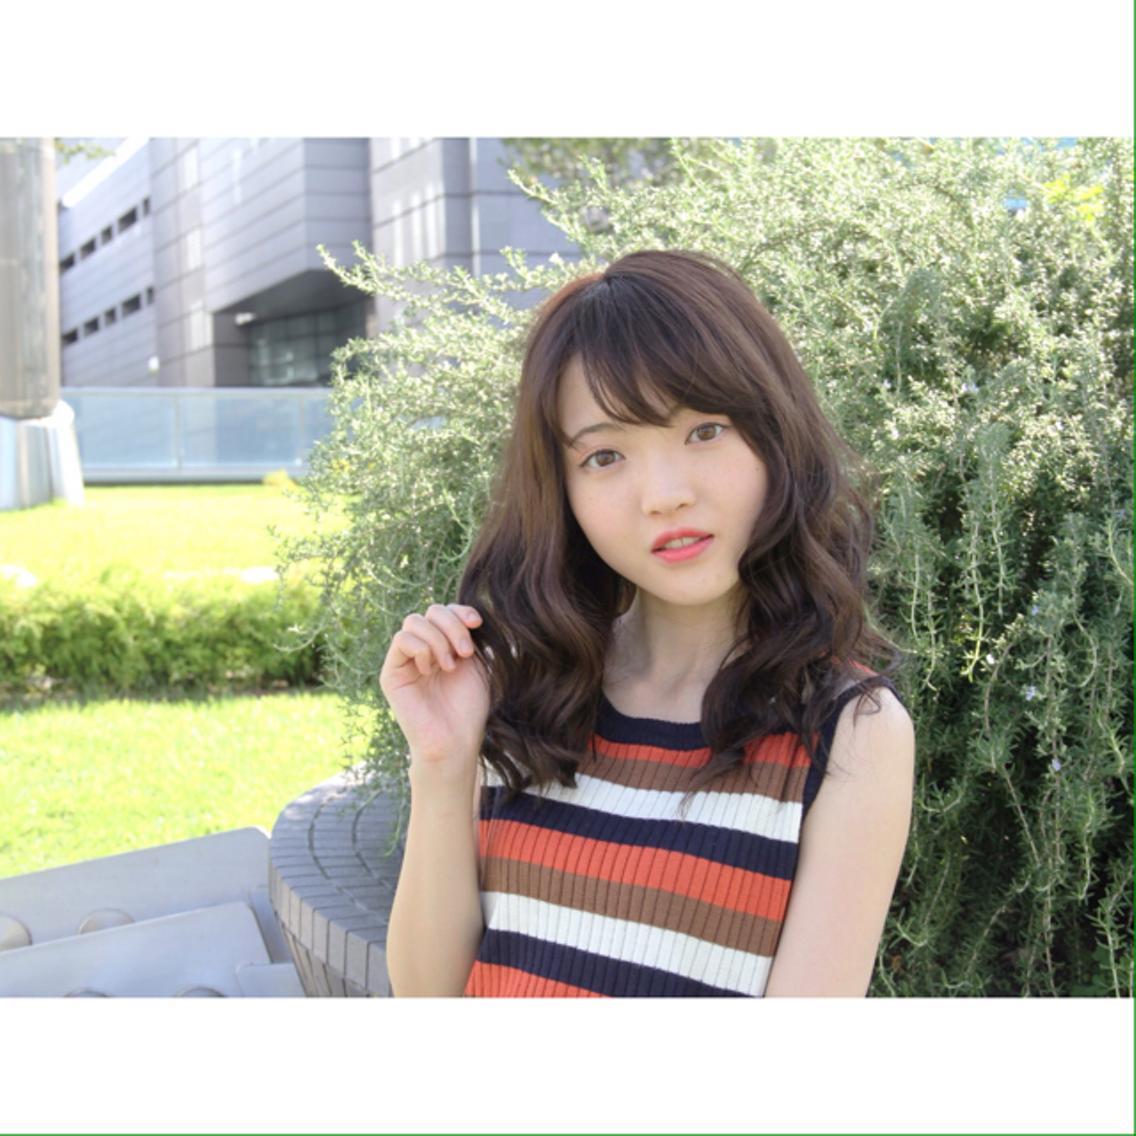 【ALLmenu50%OFF❤️】❤︎栄駅徒歩7分❤︎当日もOK☆メンズも大歓迎です★